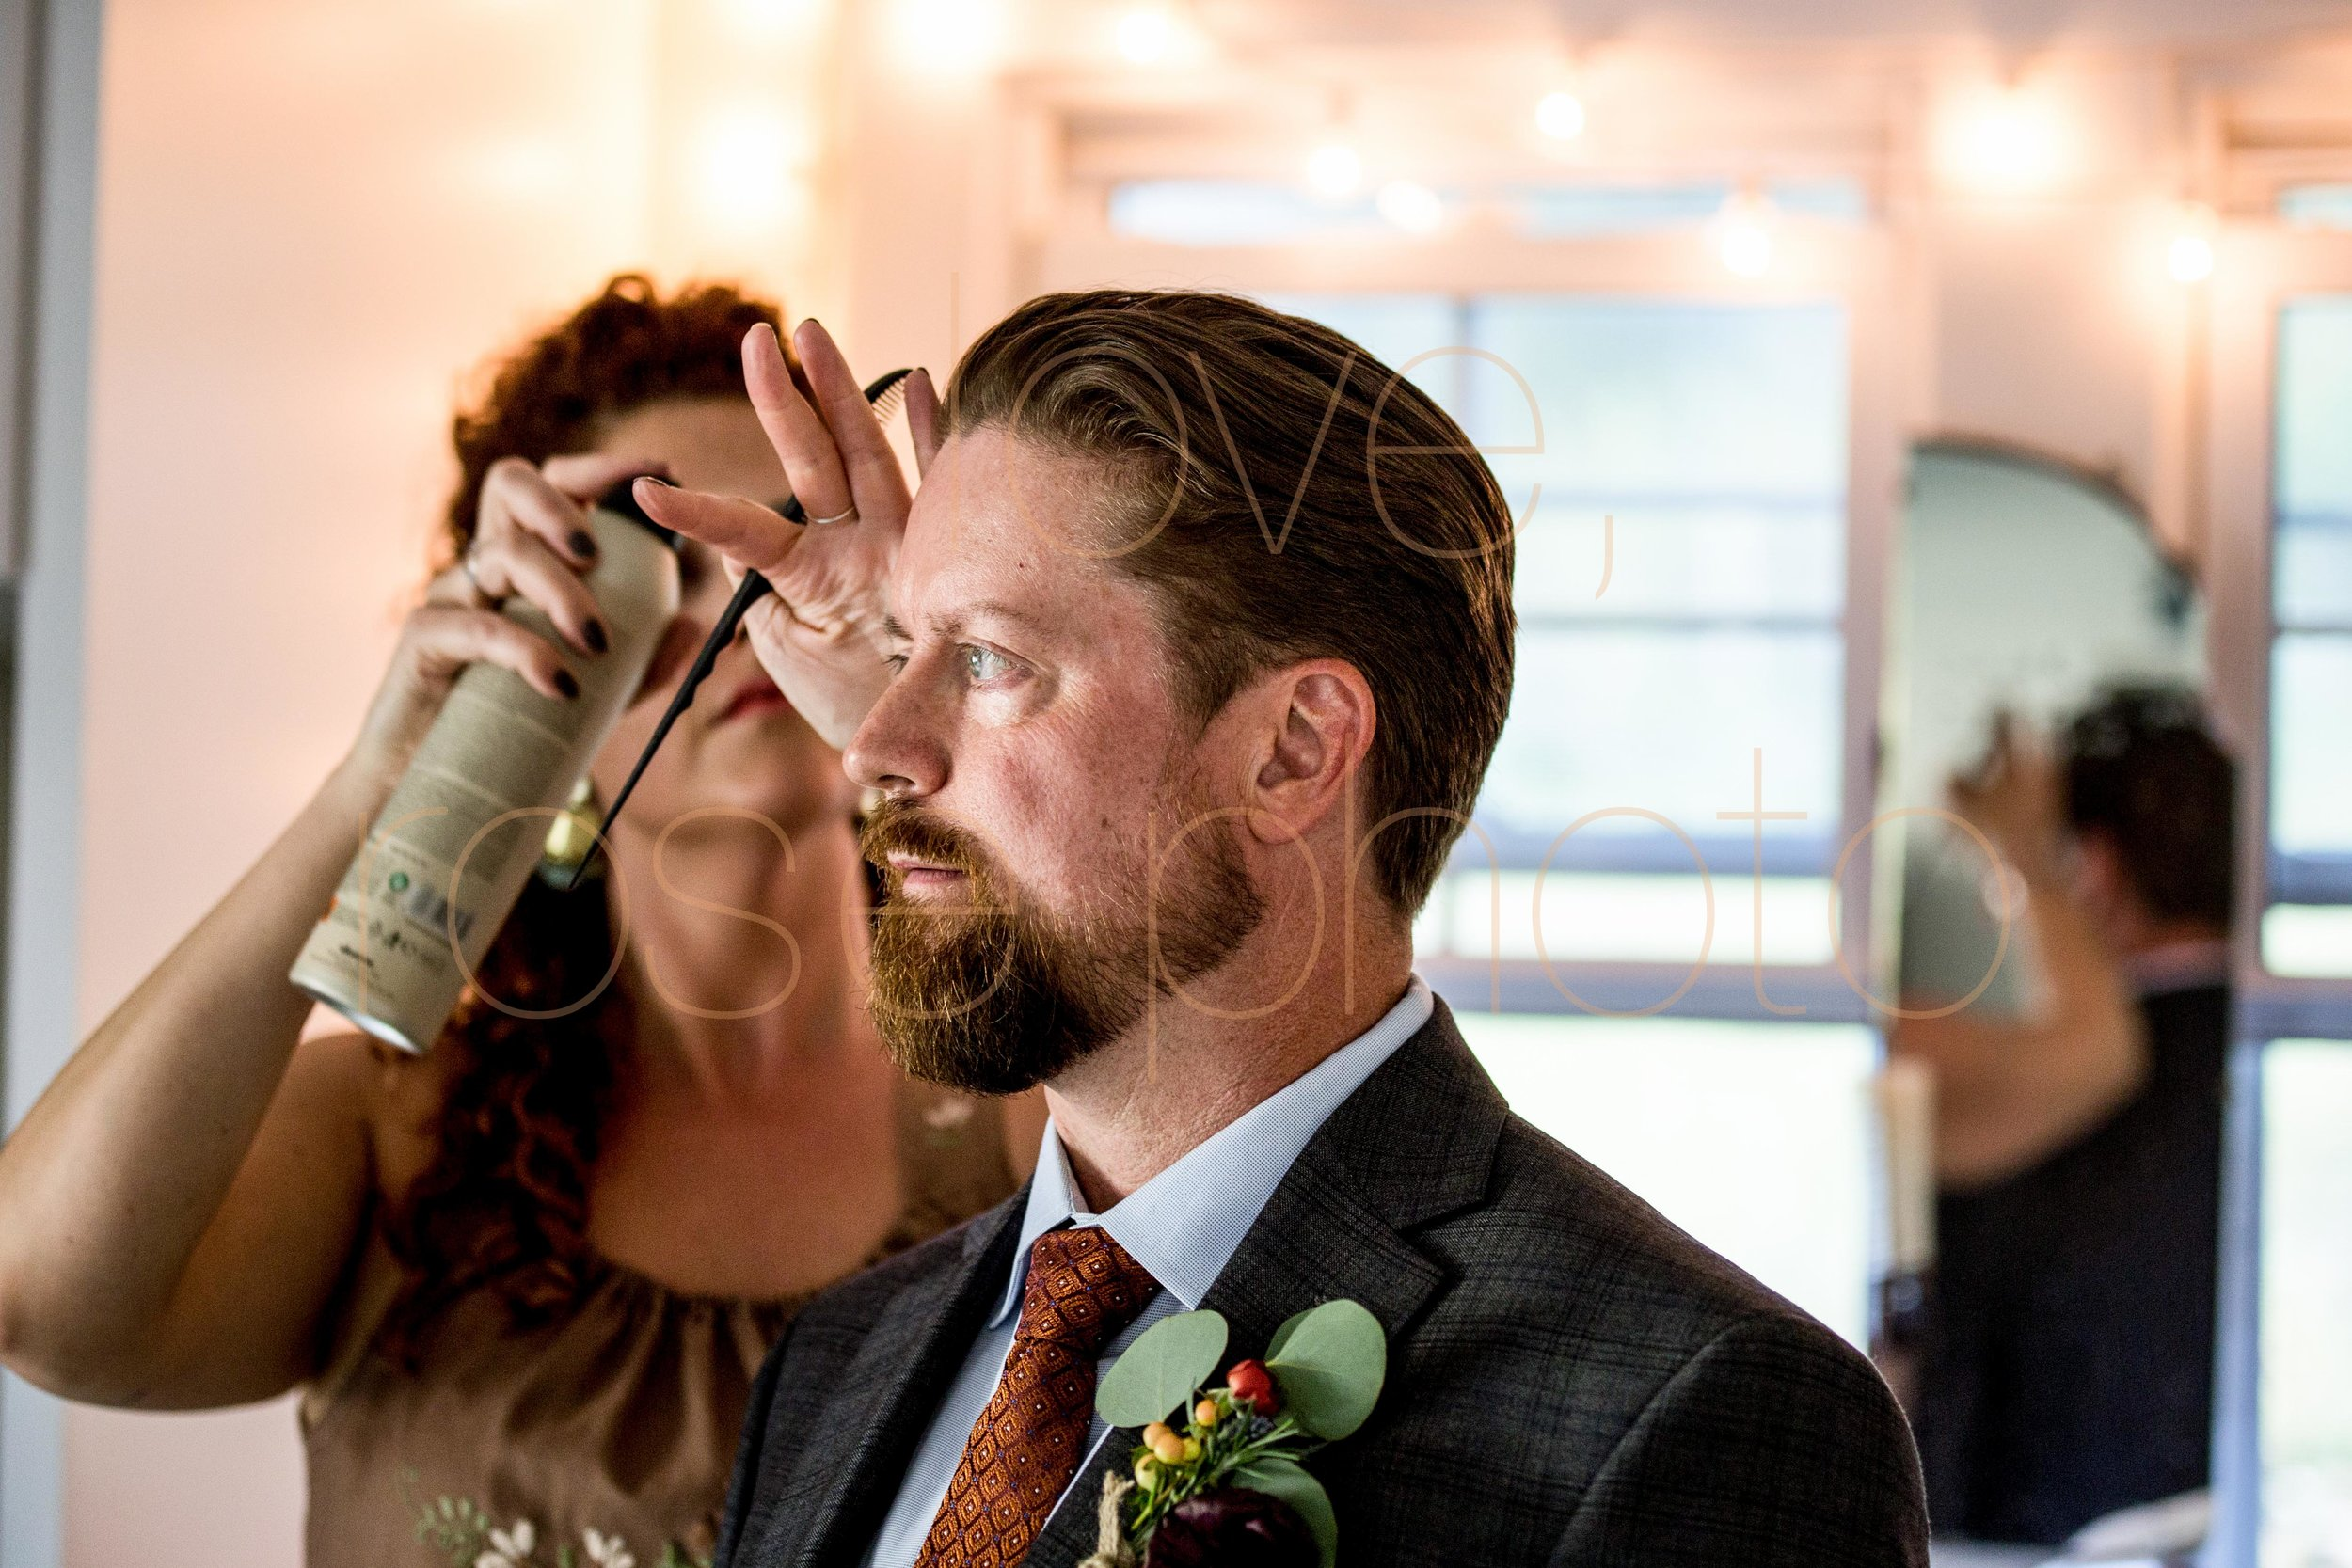 Jane Krame + Jason Ashevegas married asheville best wedding photographers -30.jpg